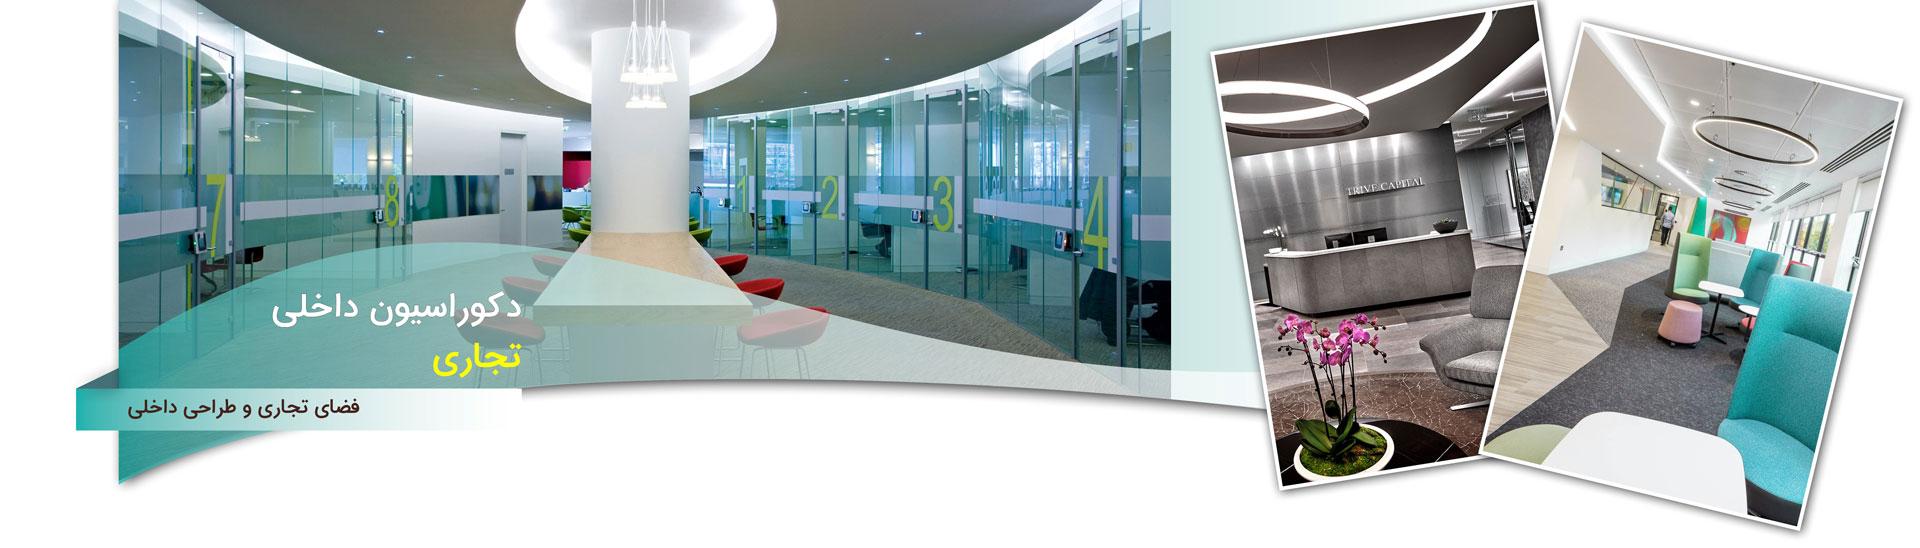 Commercial Interiors 0 - دکوراسیون داخلی تجاری